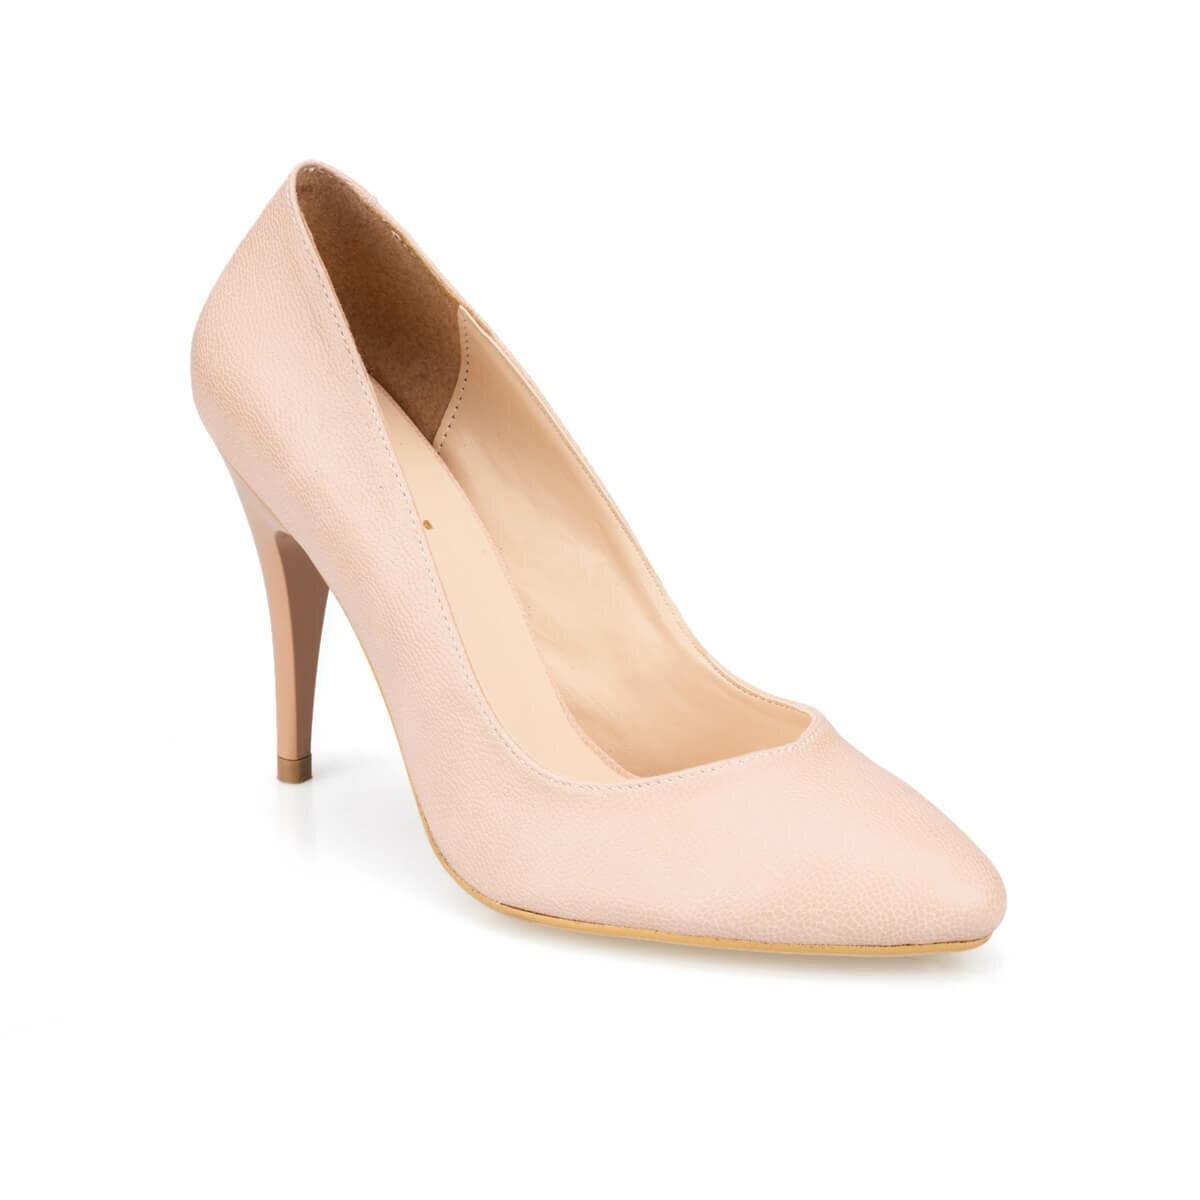 FLO 91.307263NZ Powder Female Gova Shoes Polaris